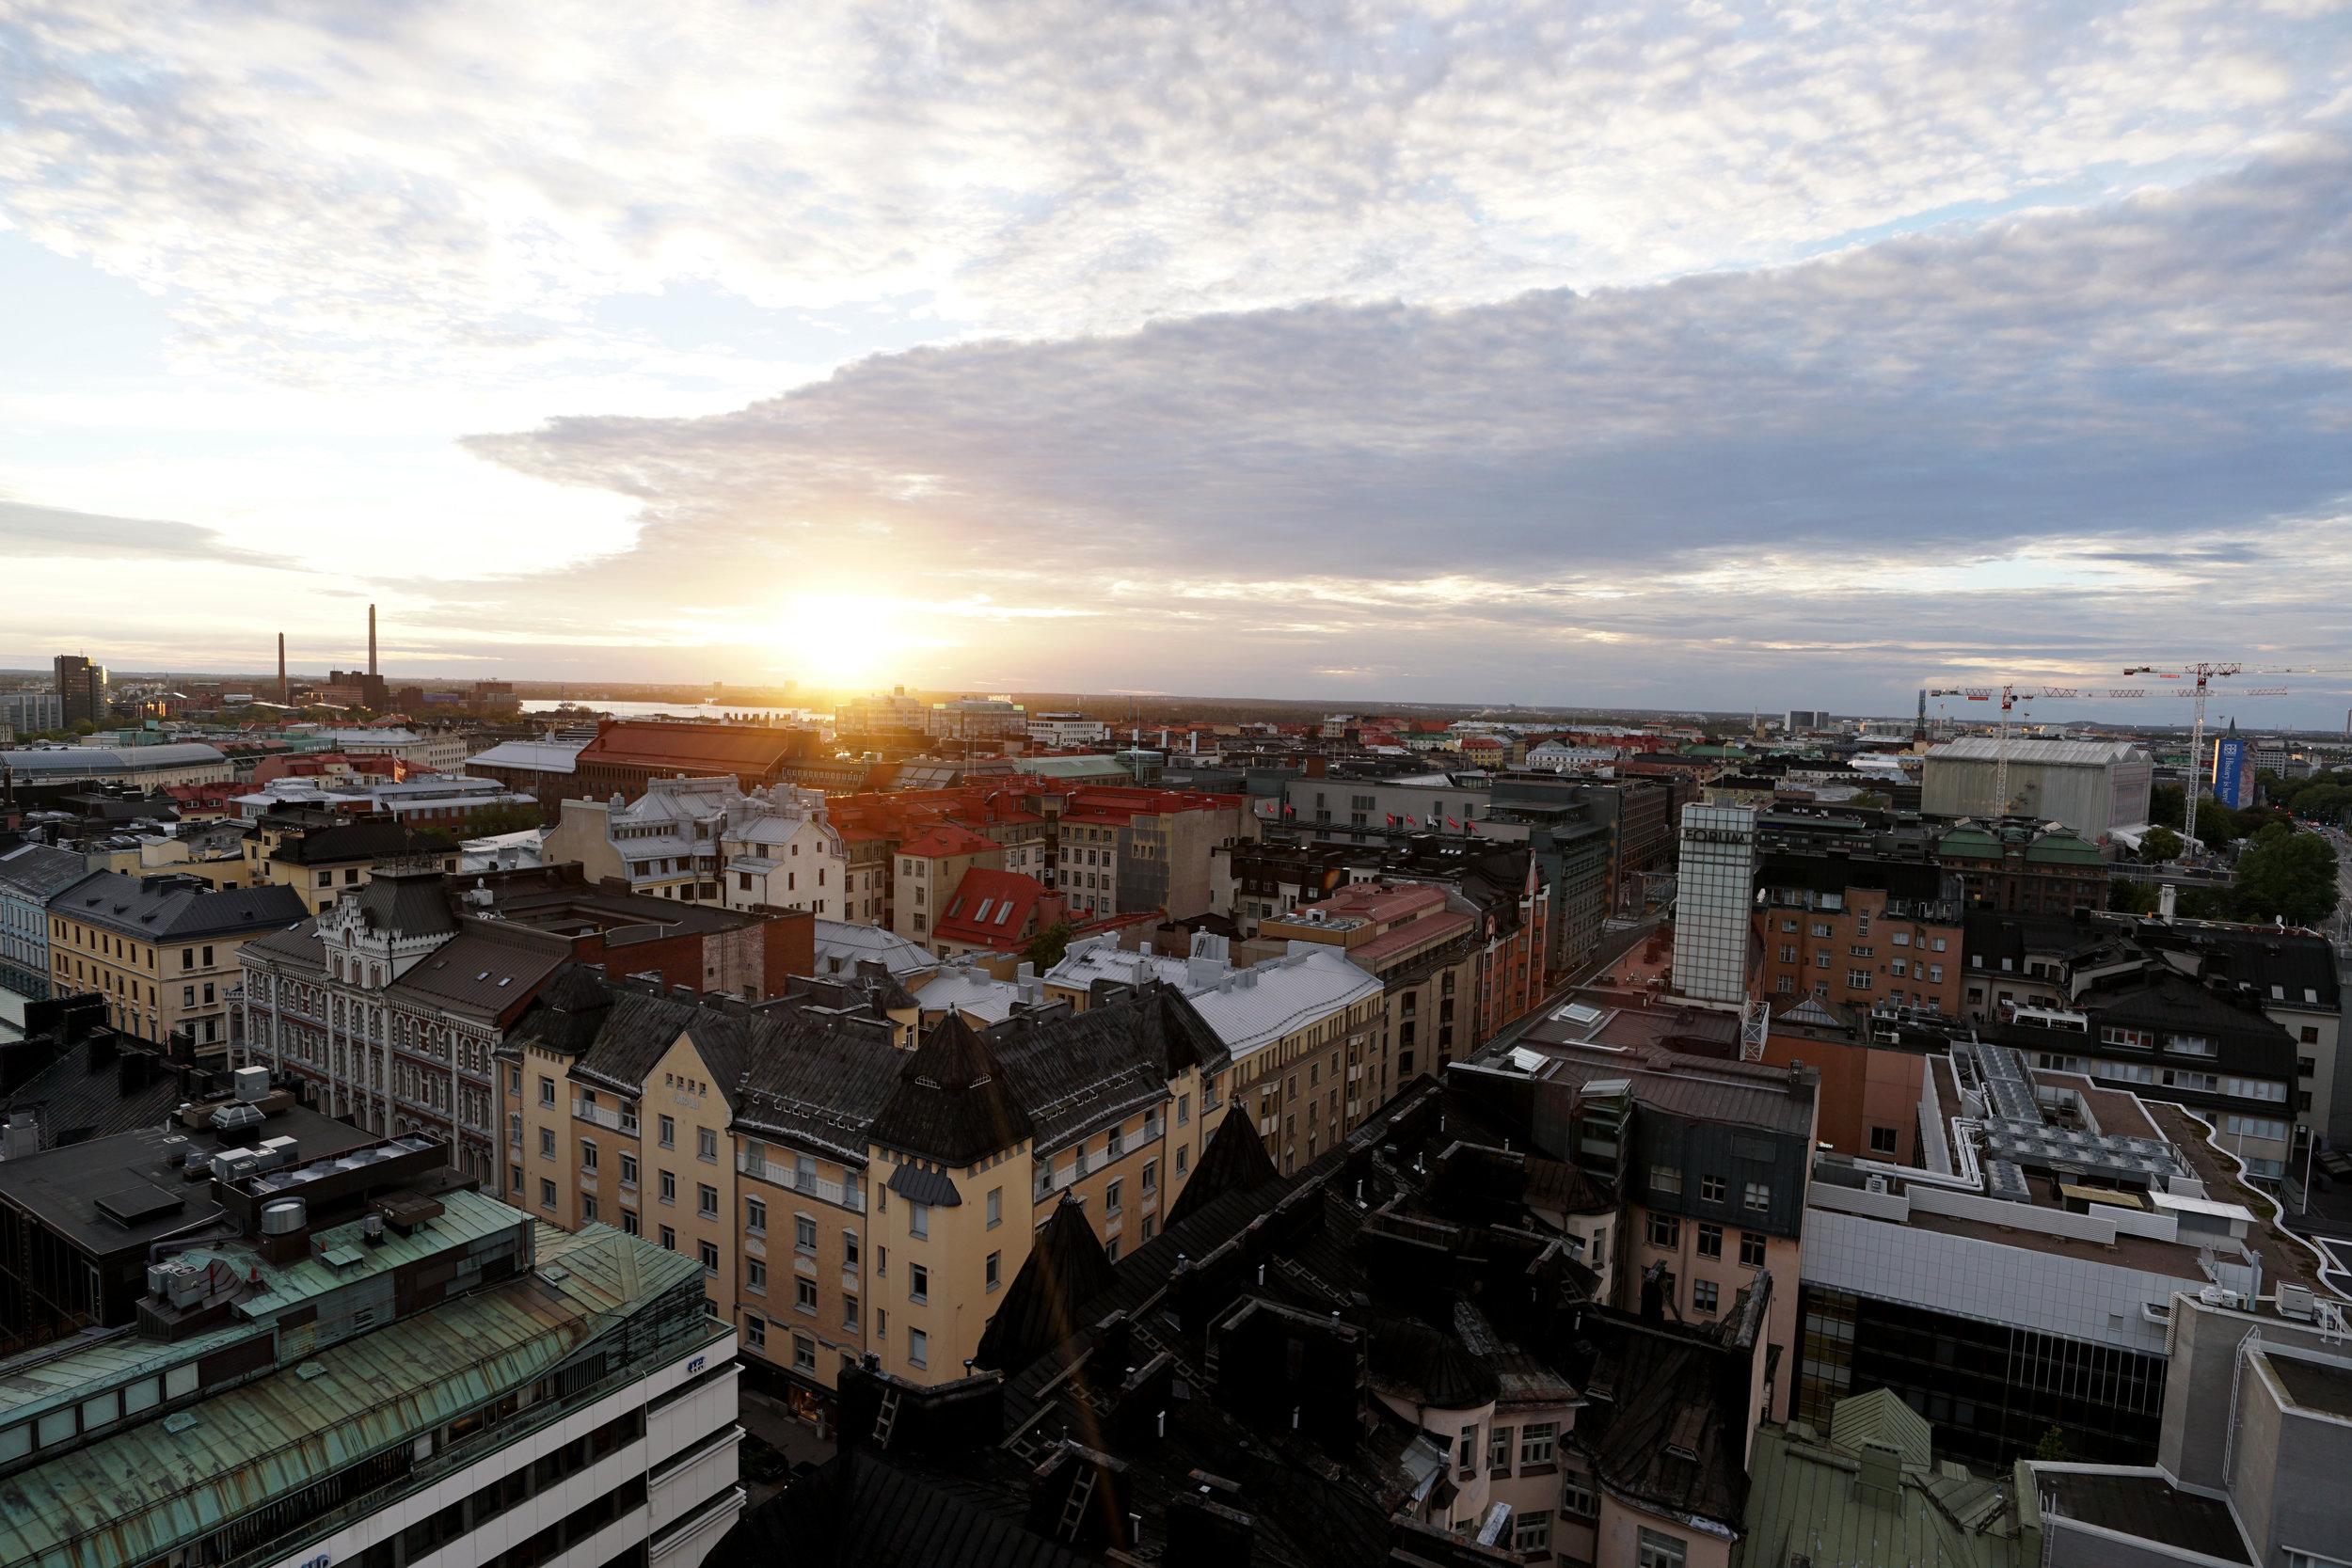 Helsinki at sunset